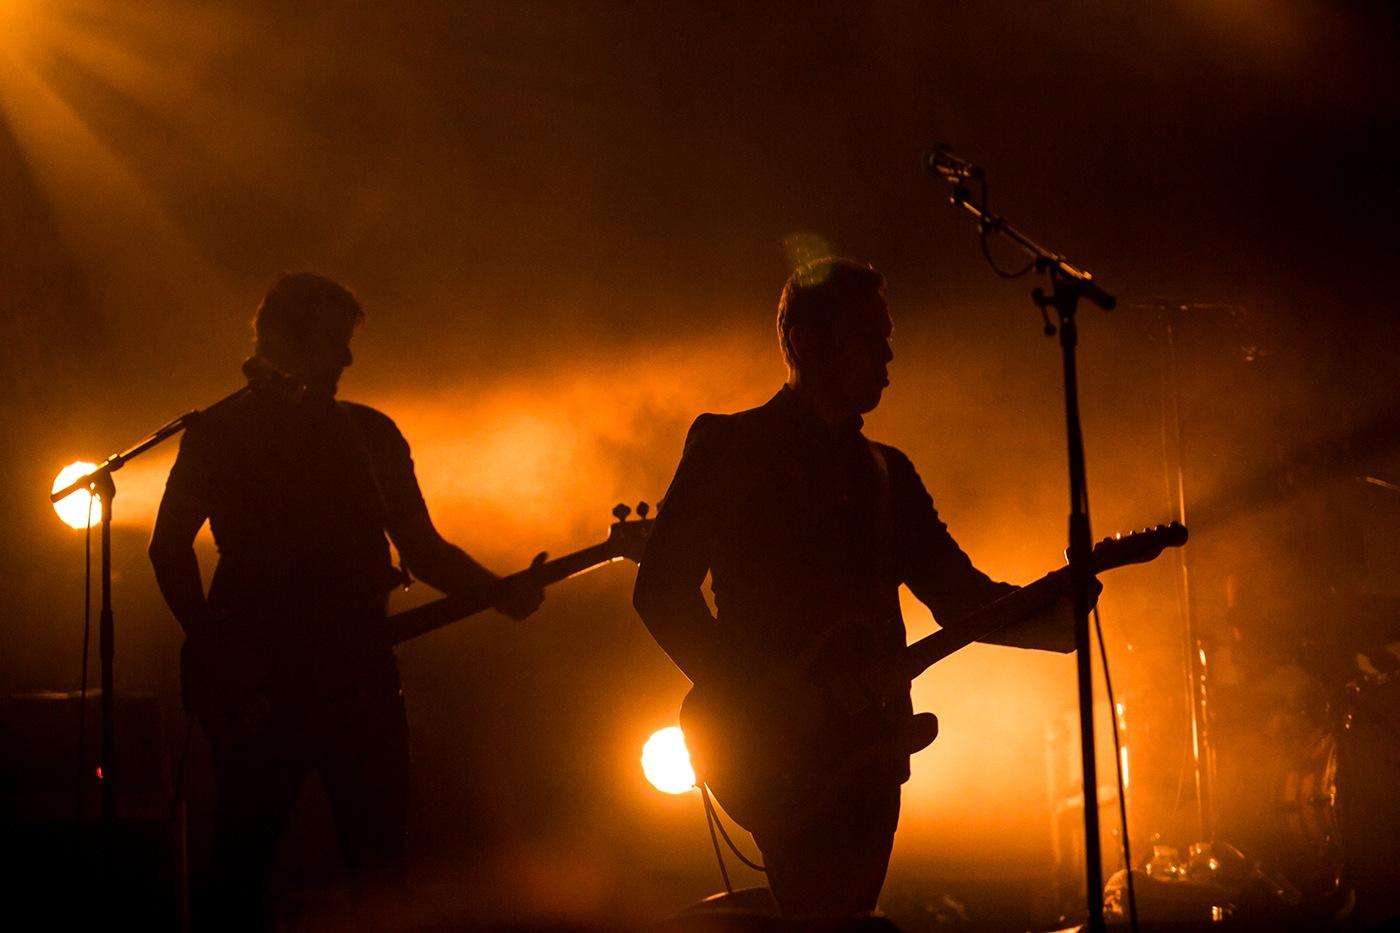 photographe-reportage-festival-rockadel-guillaume-heraud-003-small